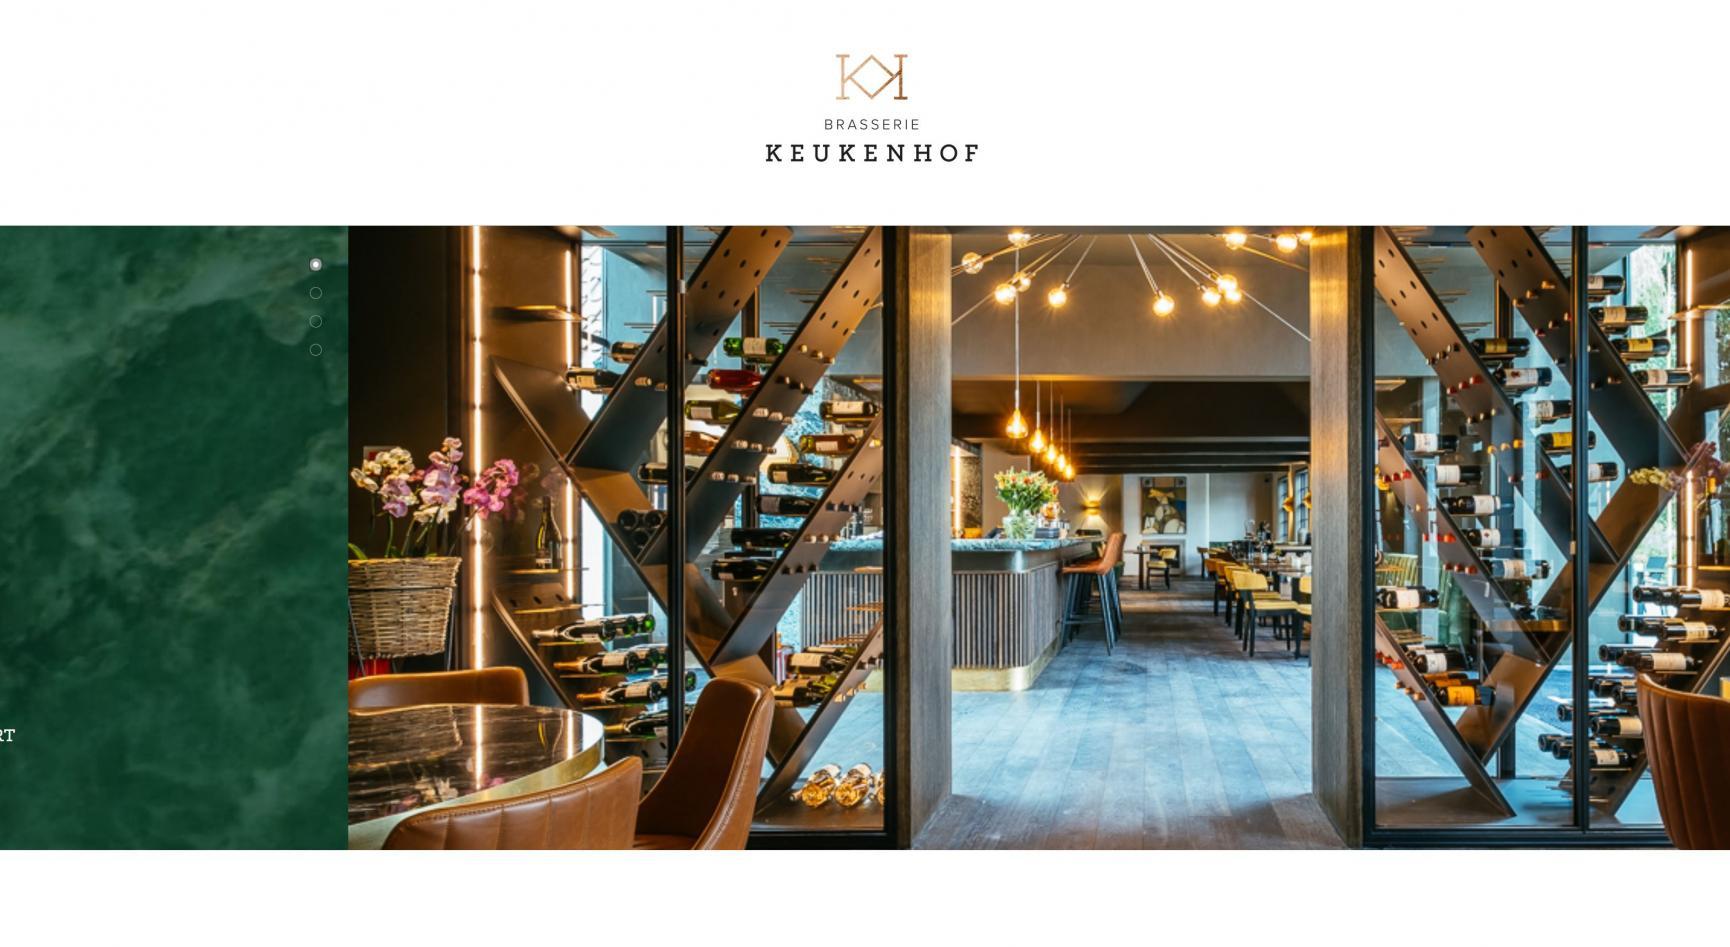 Brasserie keukenhof website ontwikkeling door Faromedia